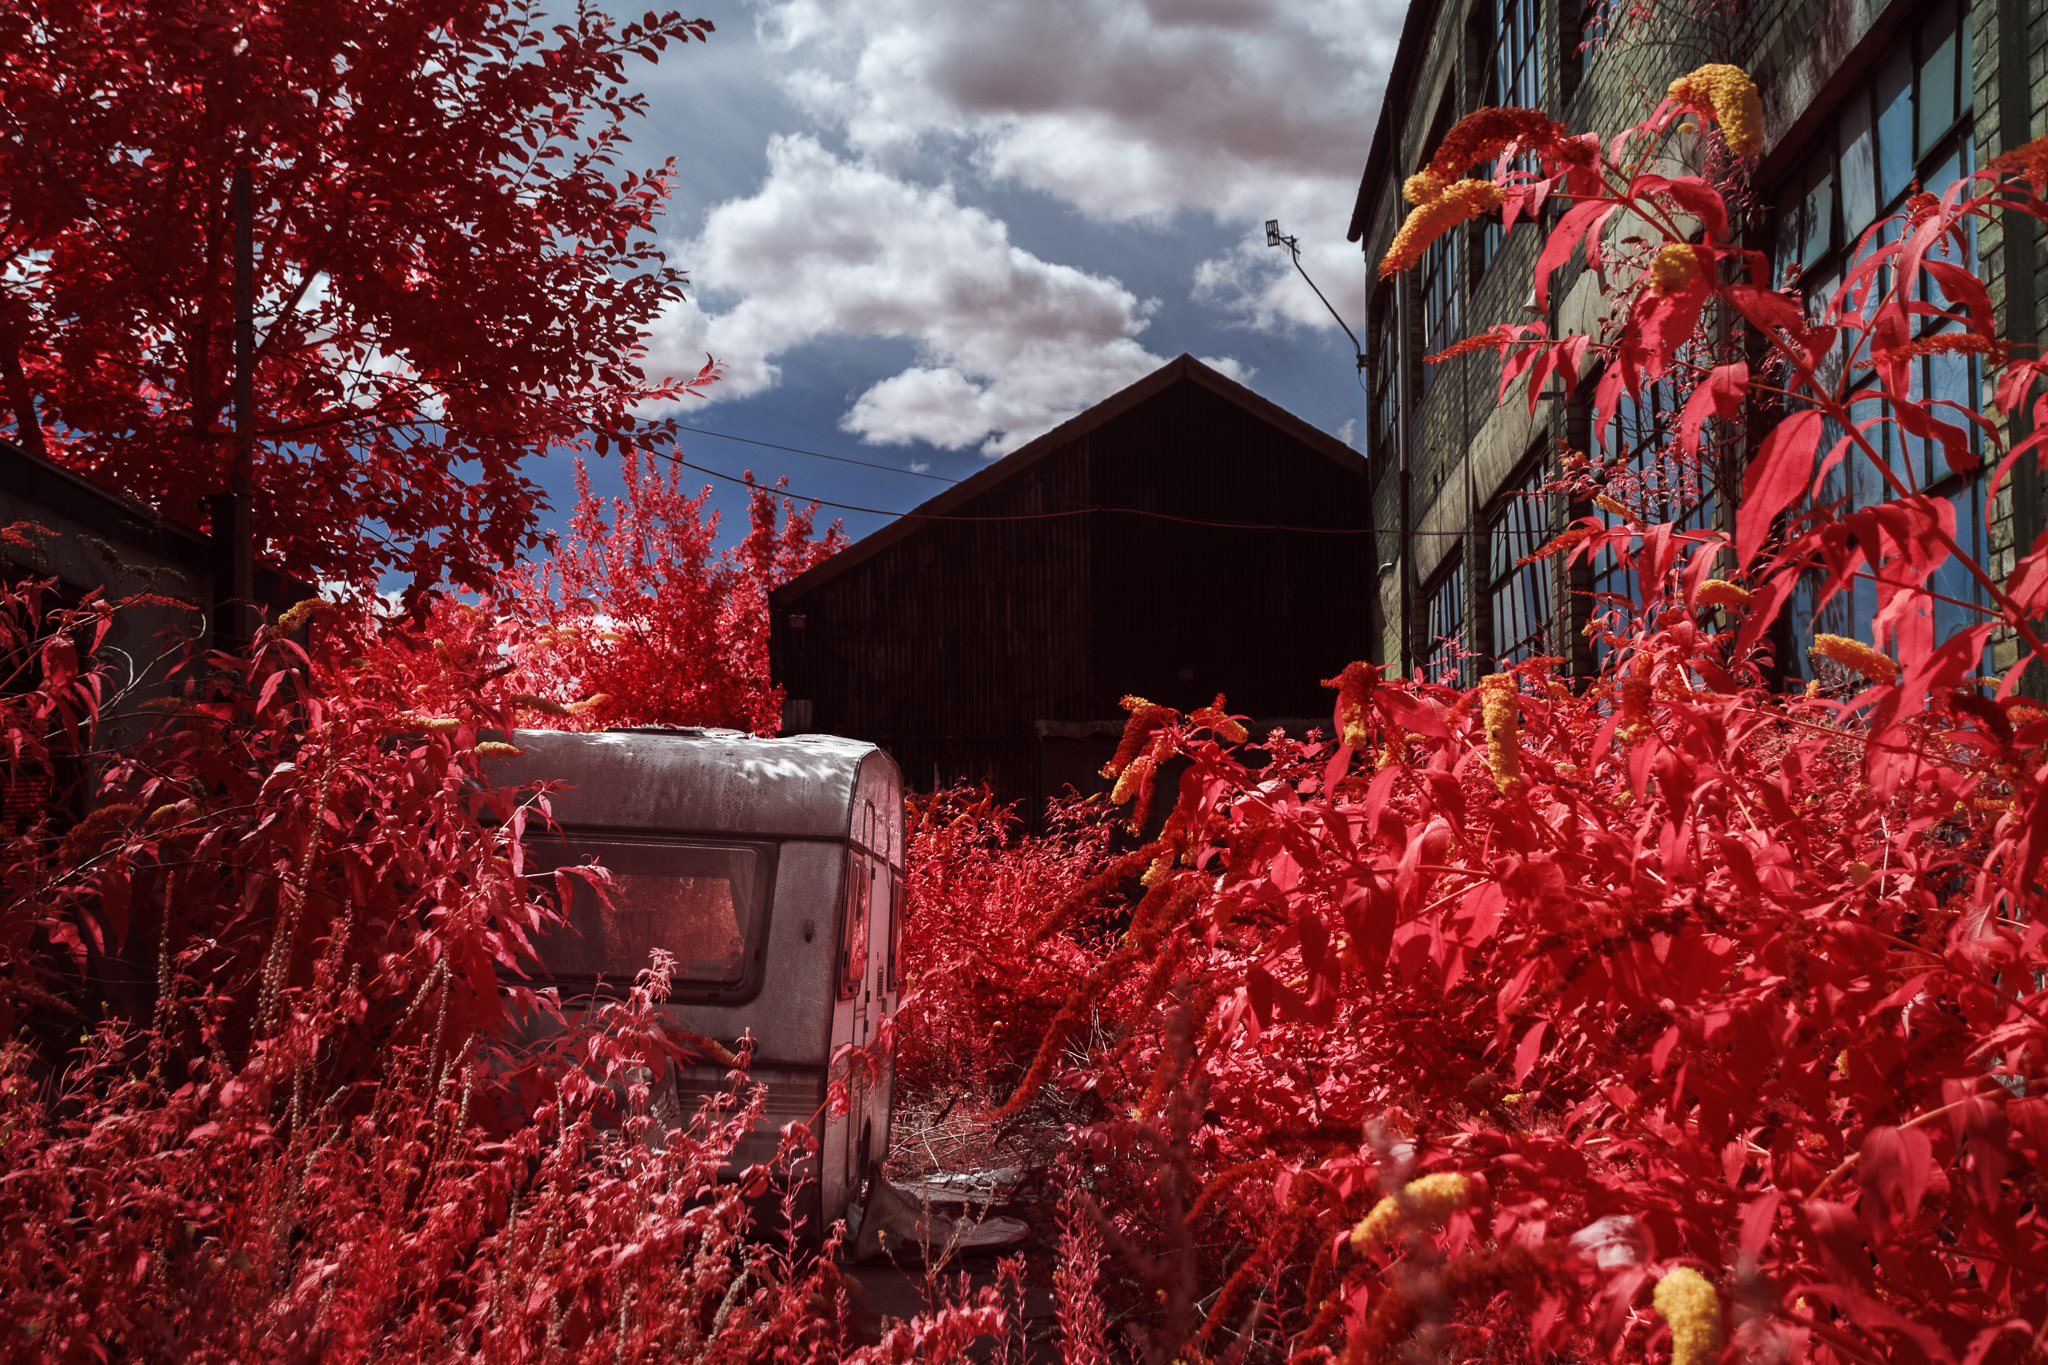 Kodak EIR Colour Infrared, Edgelands, Wasteland, Out of sight, Caravan ©Jonny Sutton